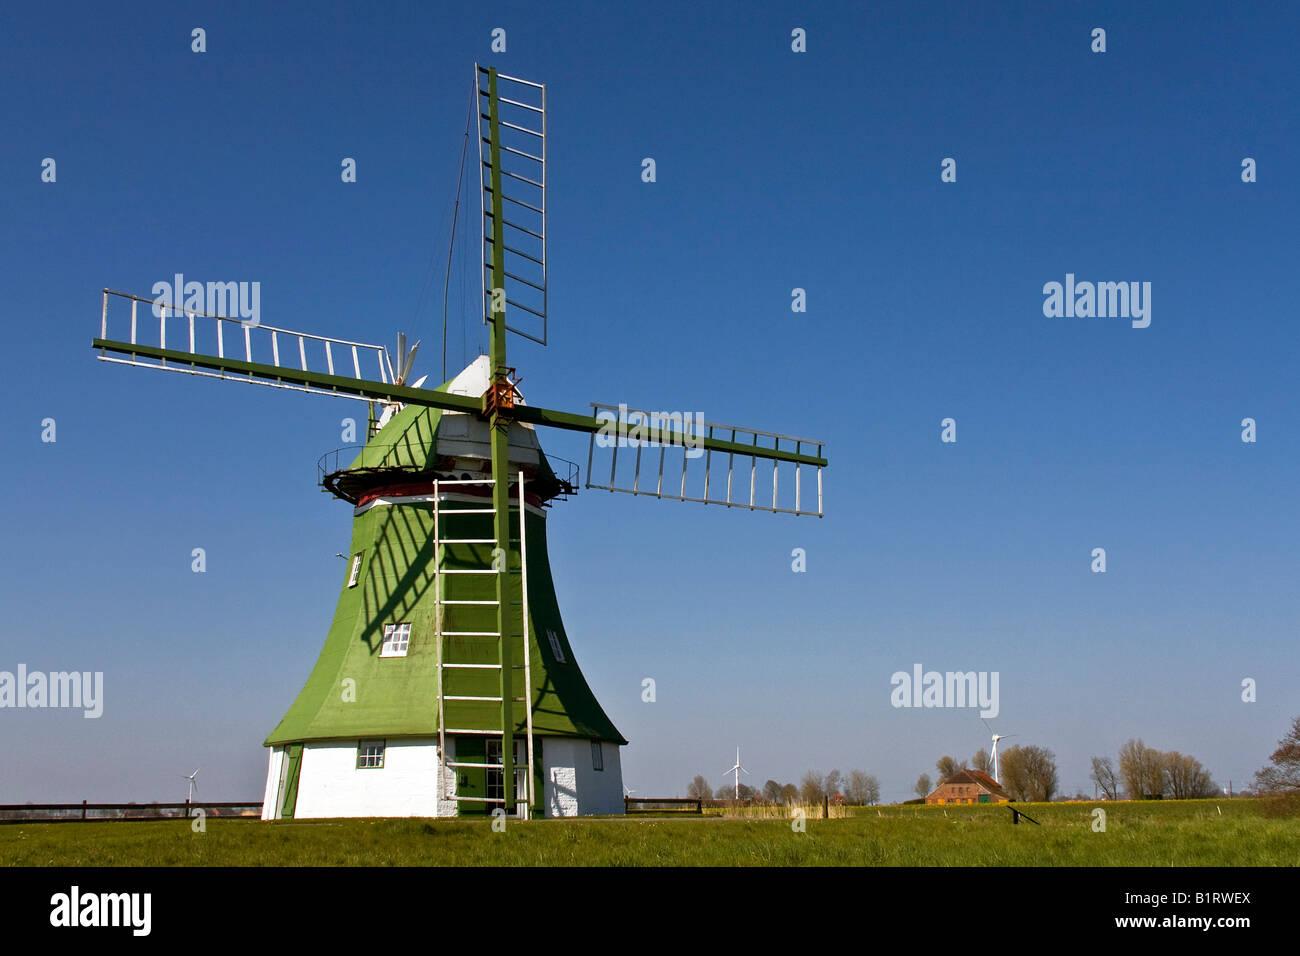 The Erdhollaender, an historic Dutch windmill near Wittmund, East Friesland, Lower Saxony, Germany, Europe Stock Photo